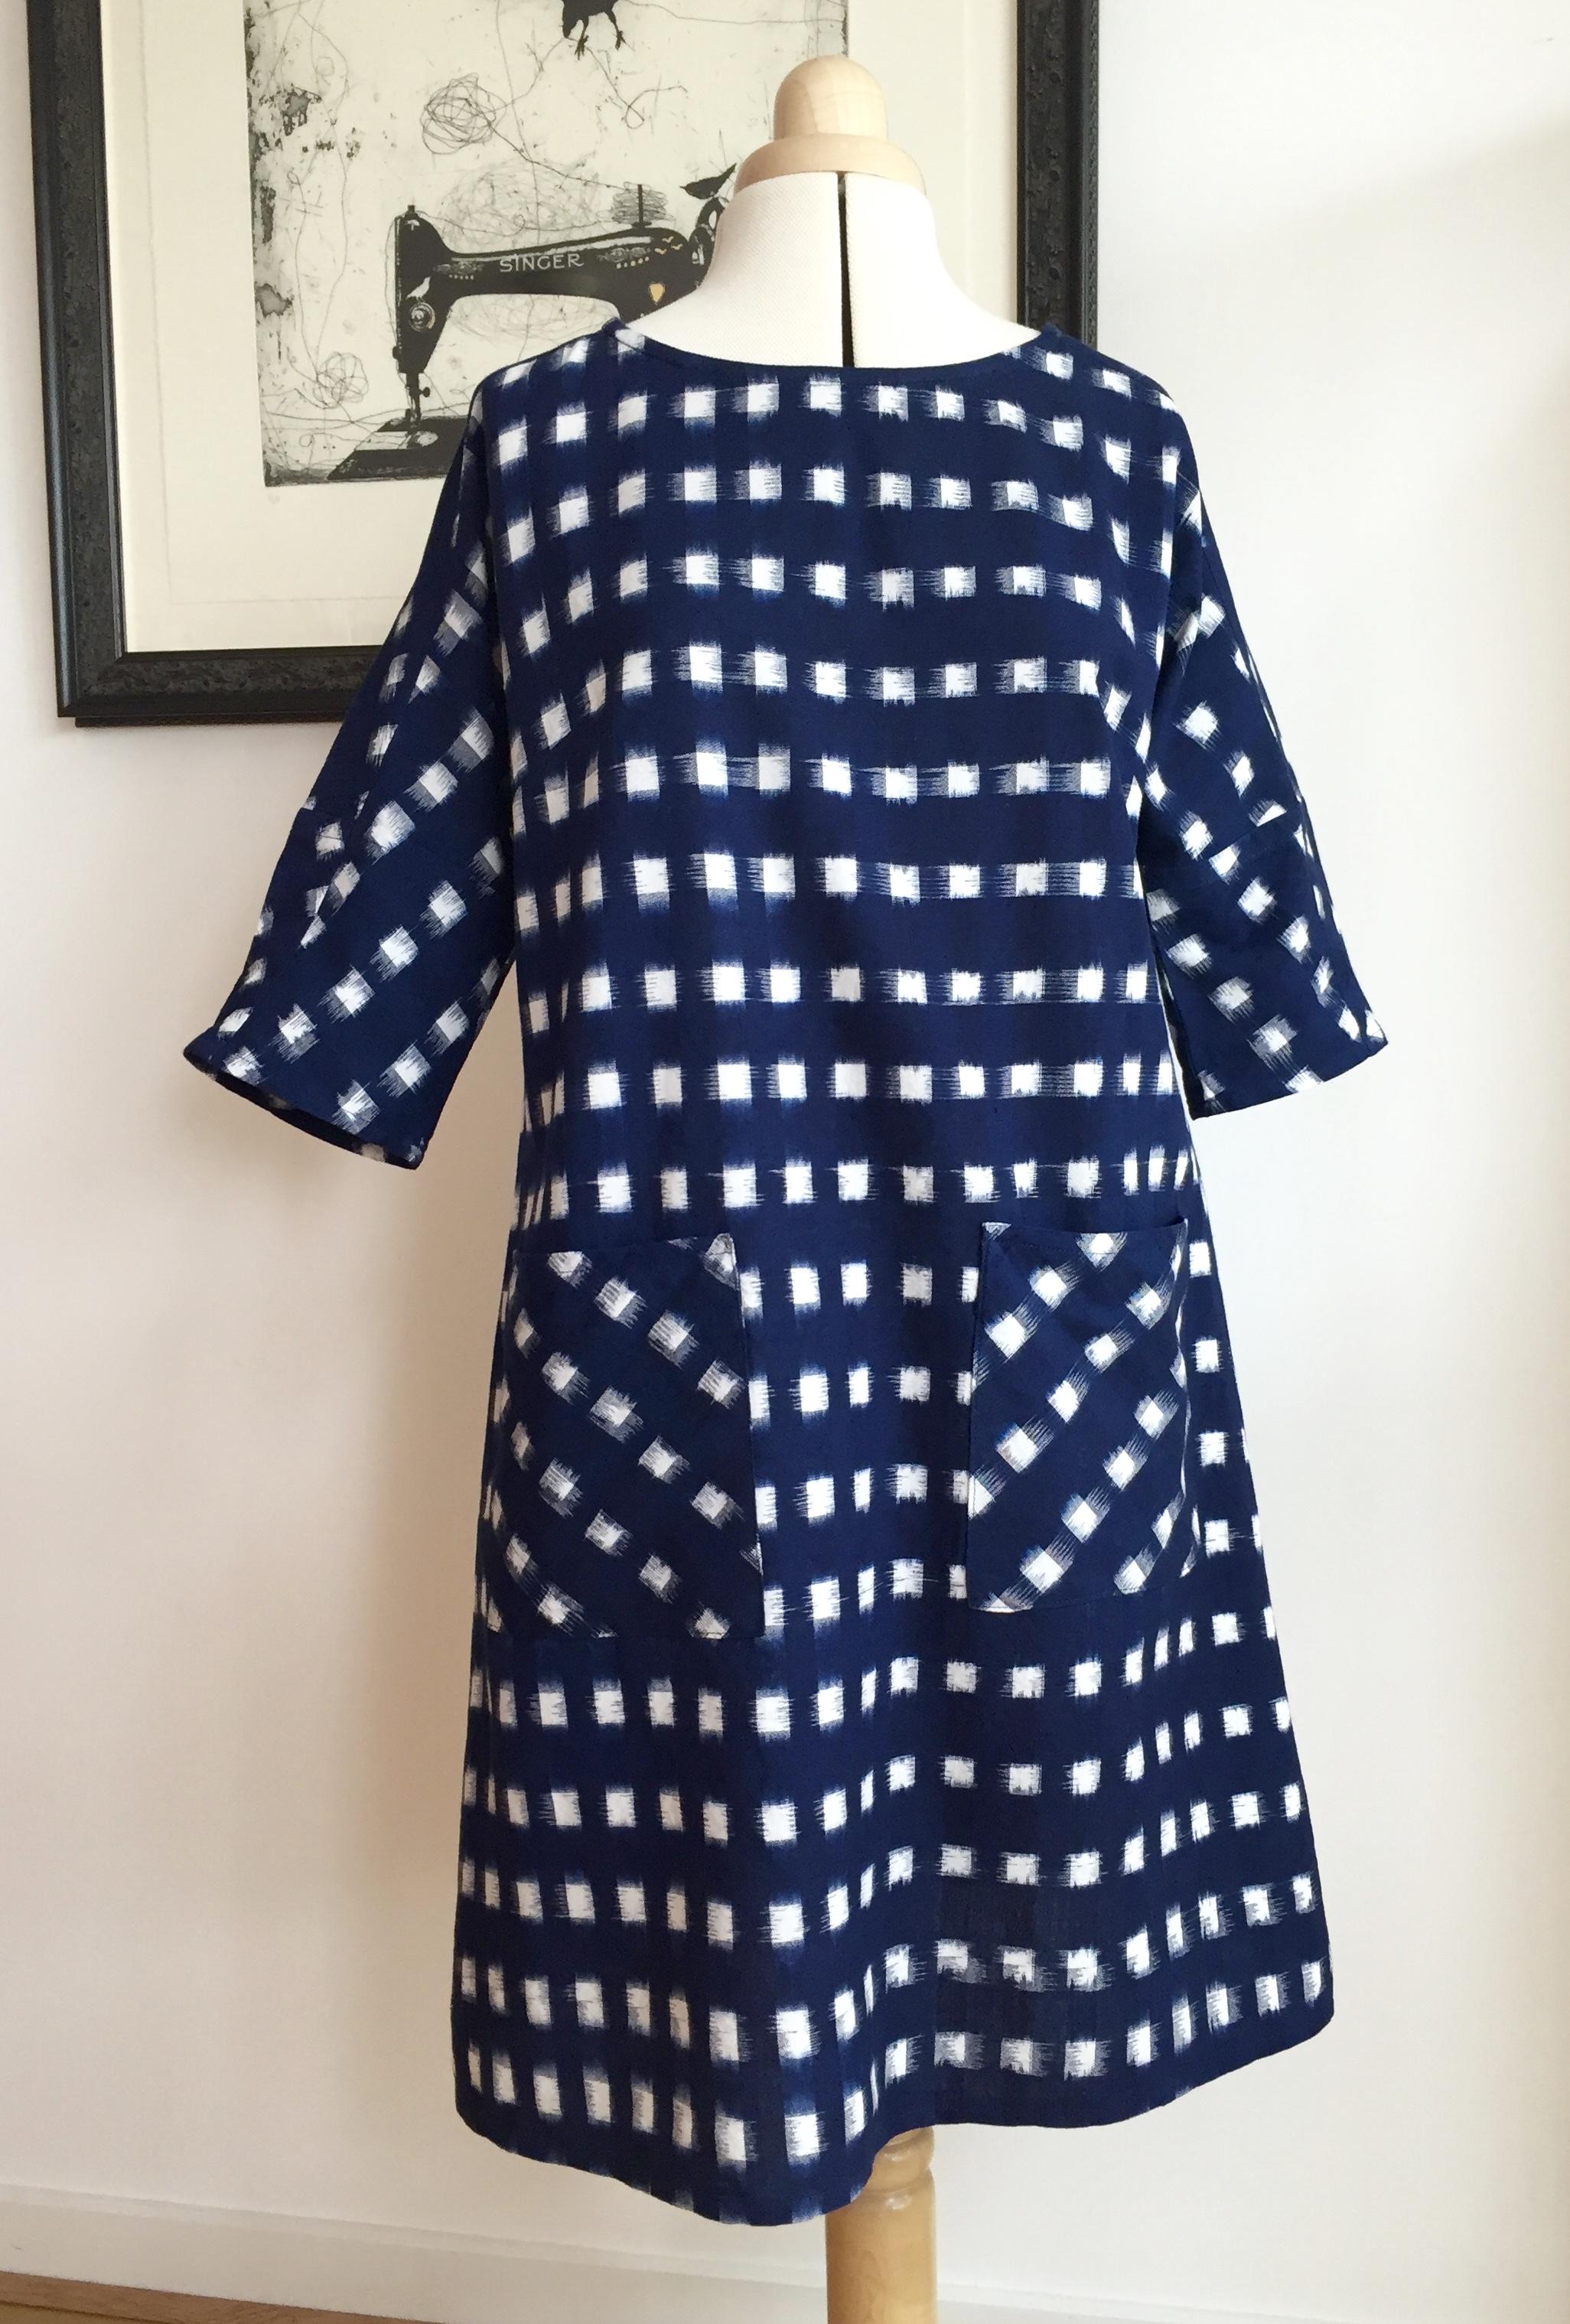 Christine Haynes ikat Lottie dress | Curate and create